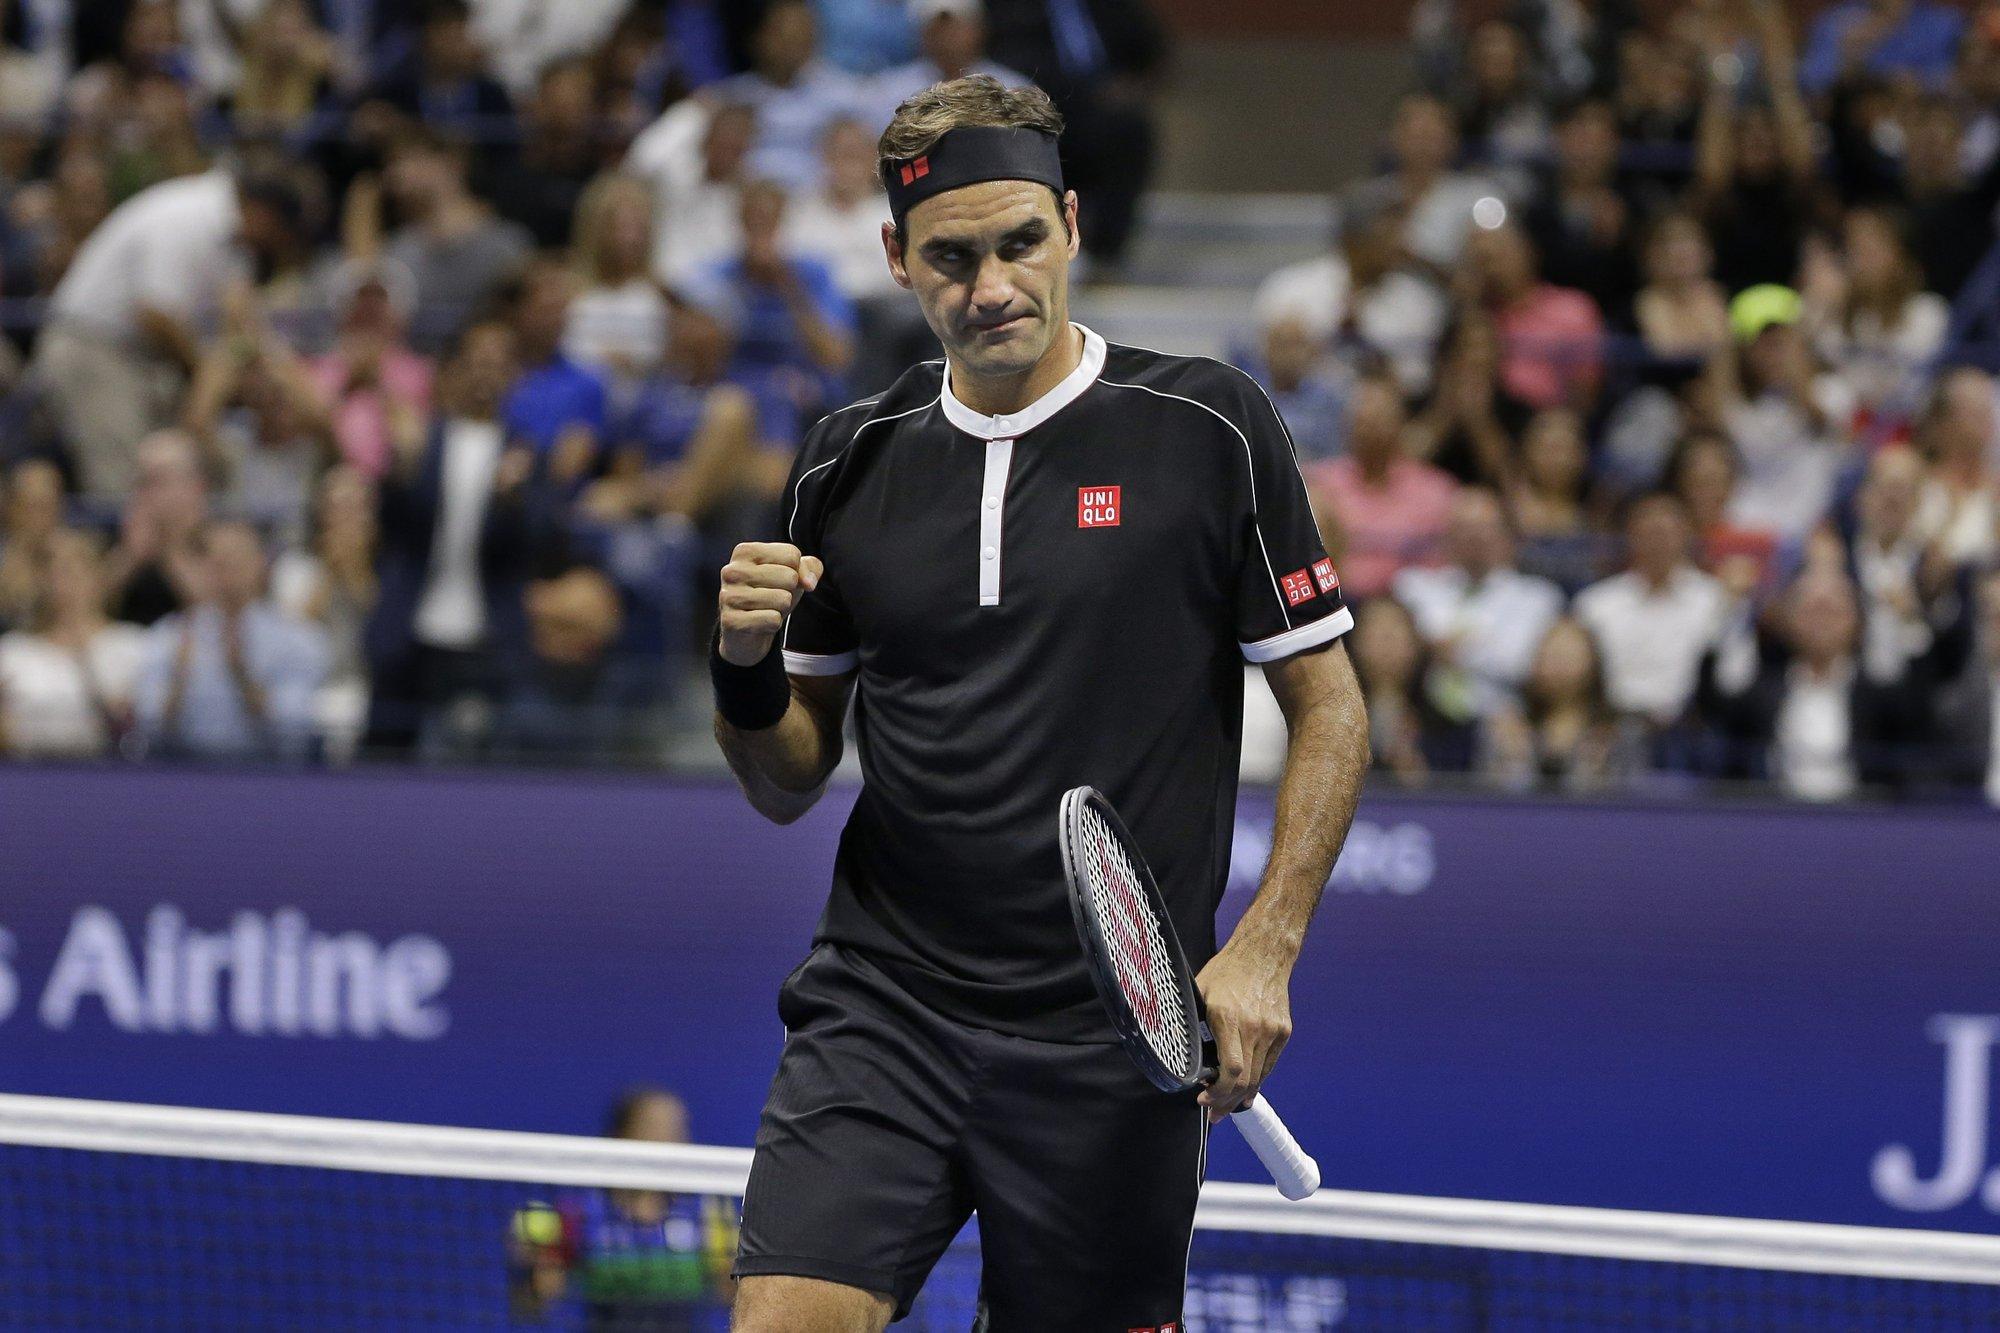 Roger Federer to decide soon on Tokyo Olympic plans